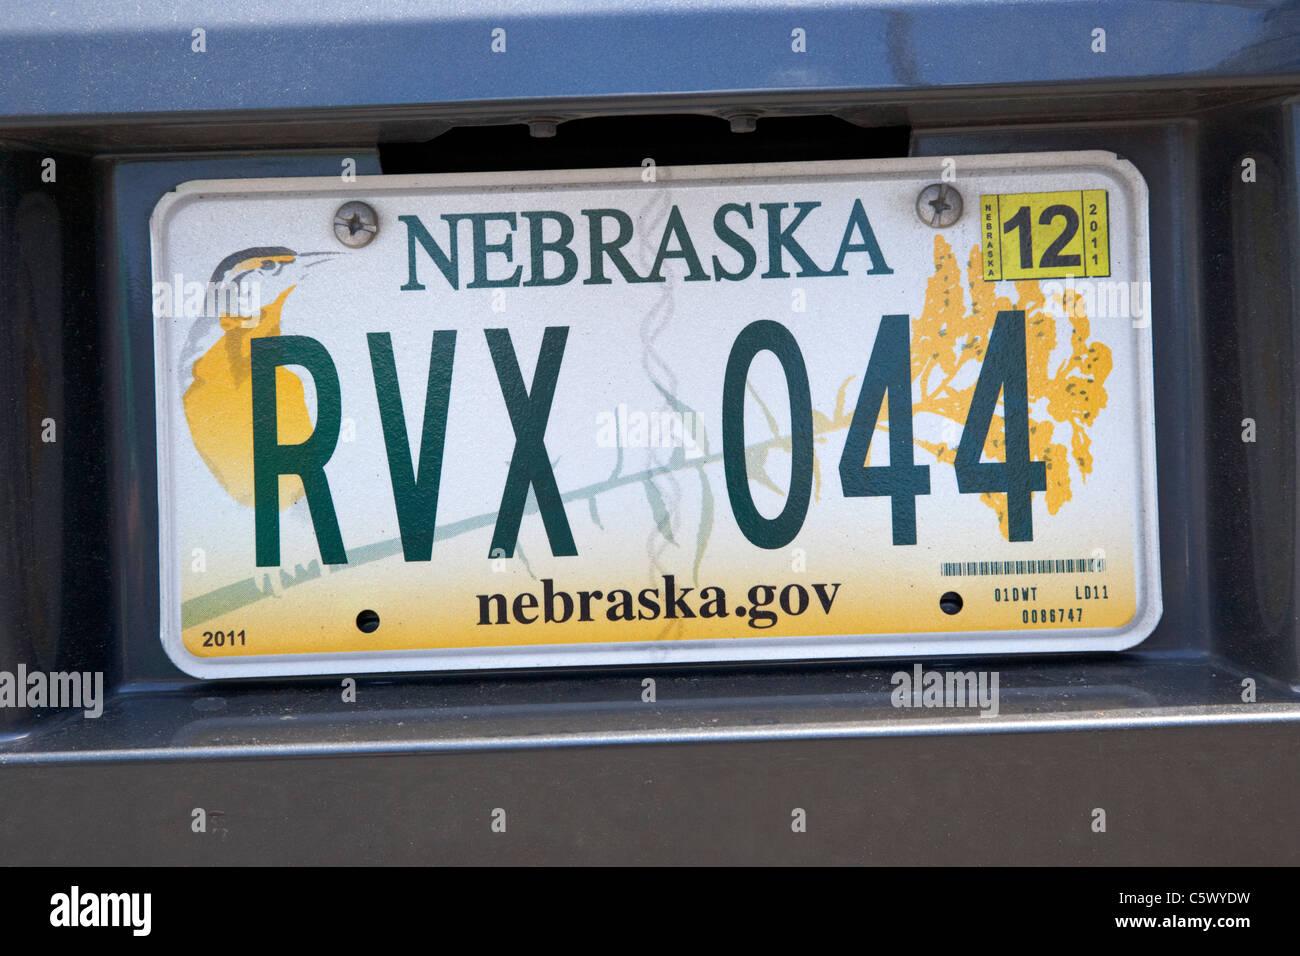 nebraska vehicle license plate state usa Stock Photo: 38064373 - Alamy